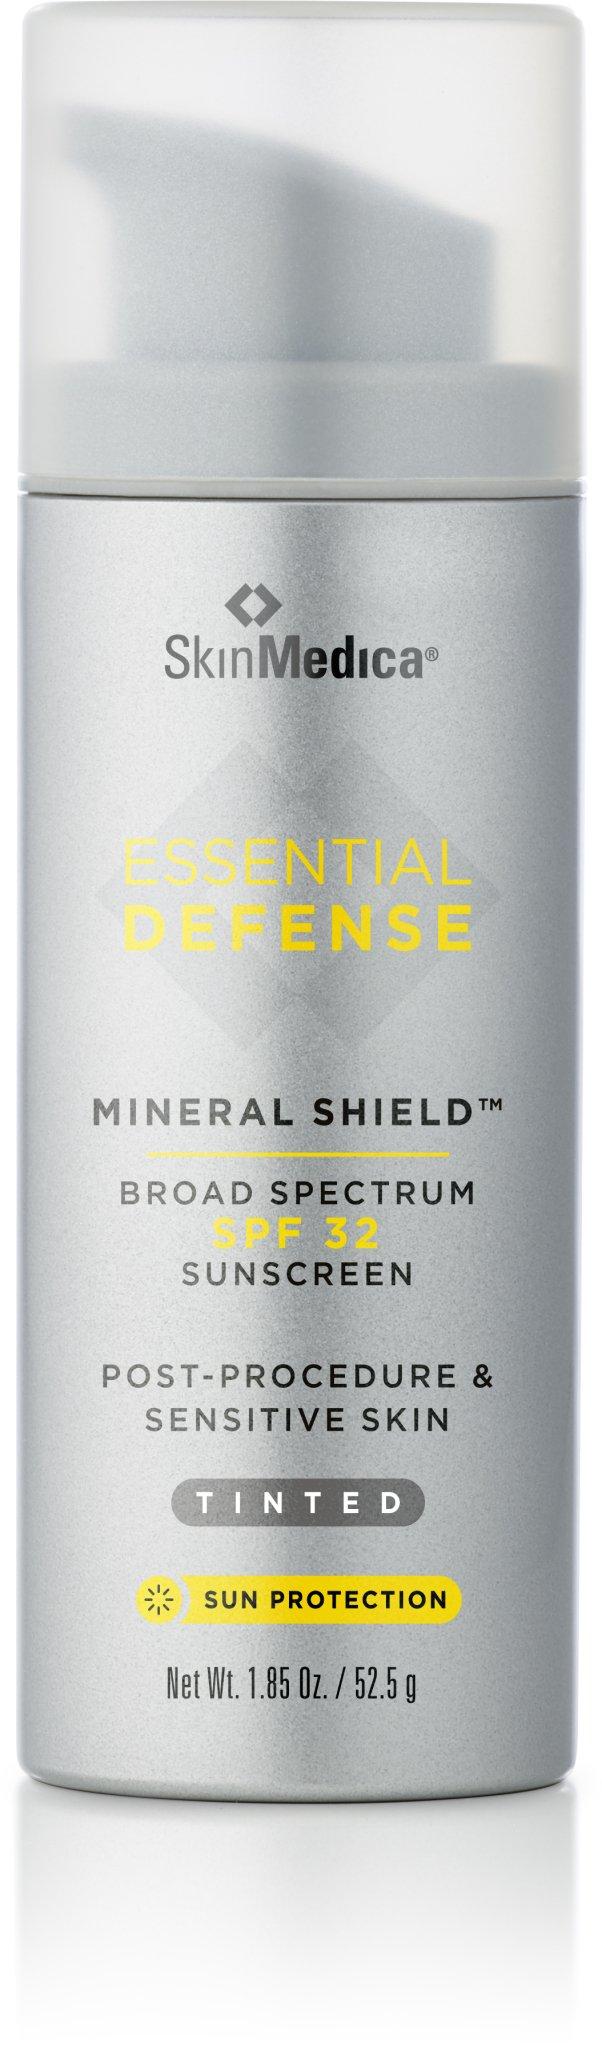 SkinMedica Essential Defense Mineral Shield SPF 32, Tinted, 1.85 oz.